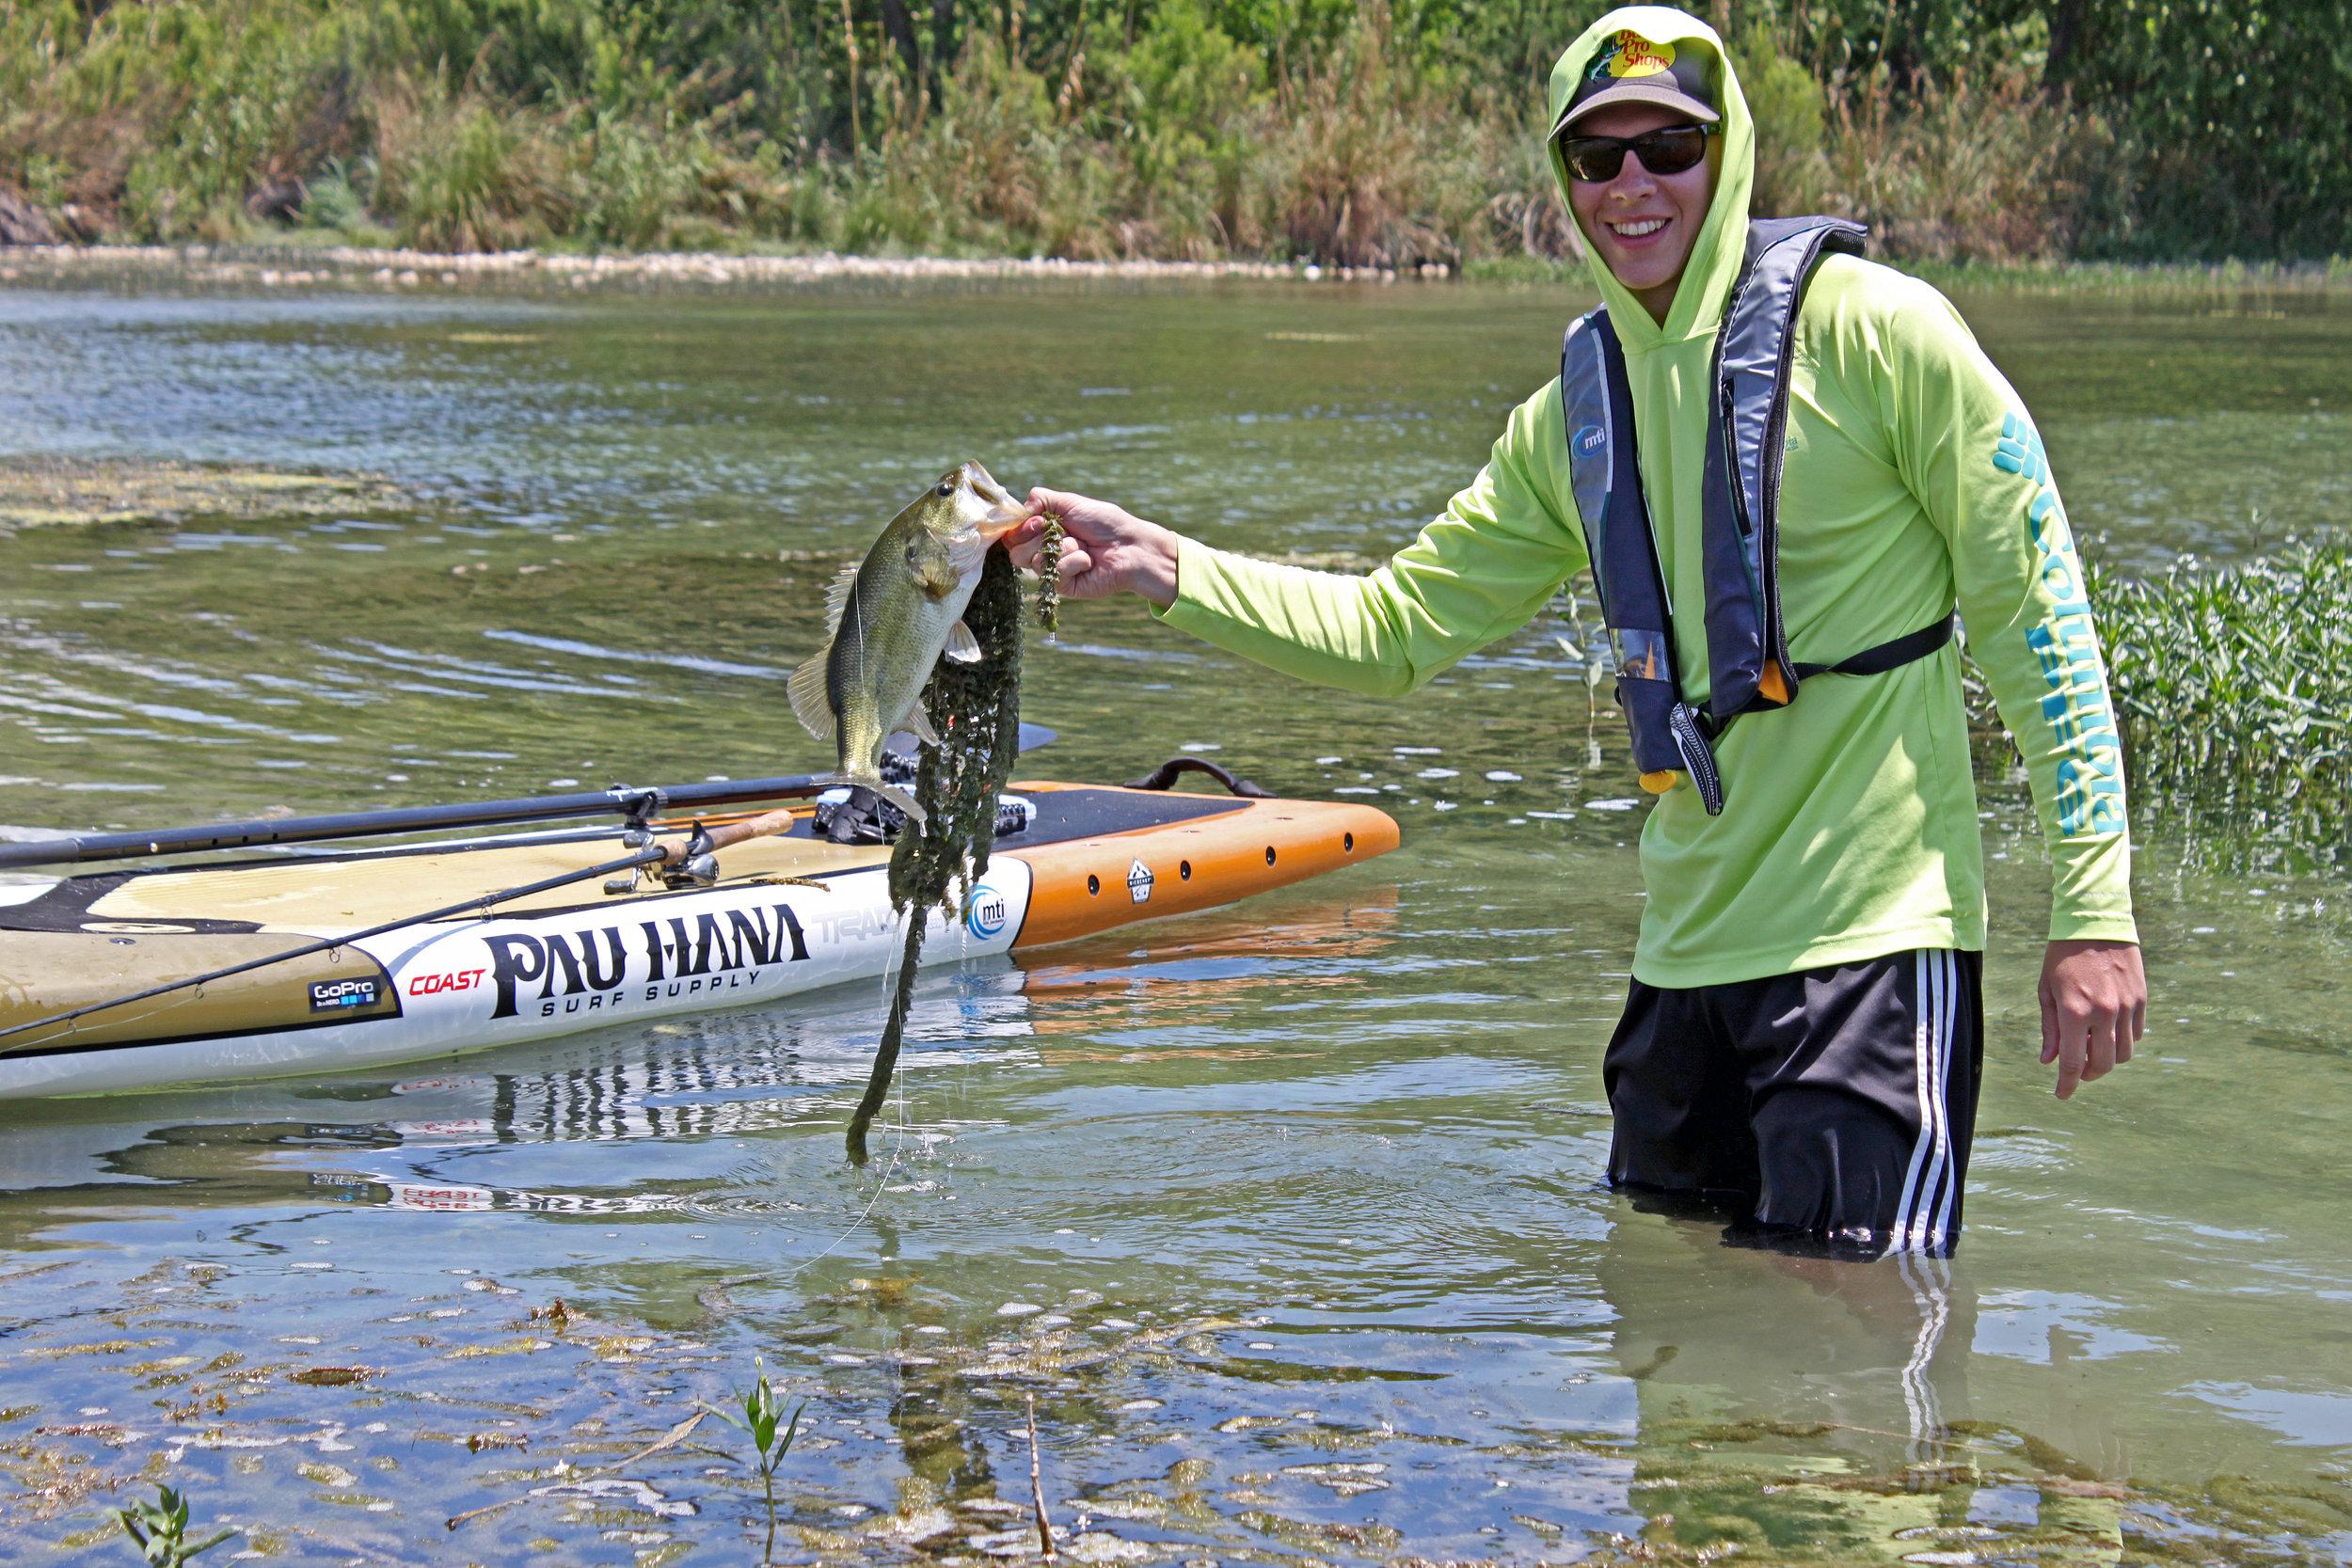 Clint Taylor Pau Hana Endurance on the Devils River